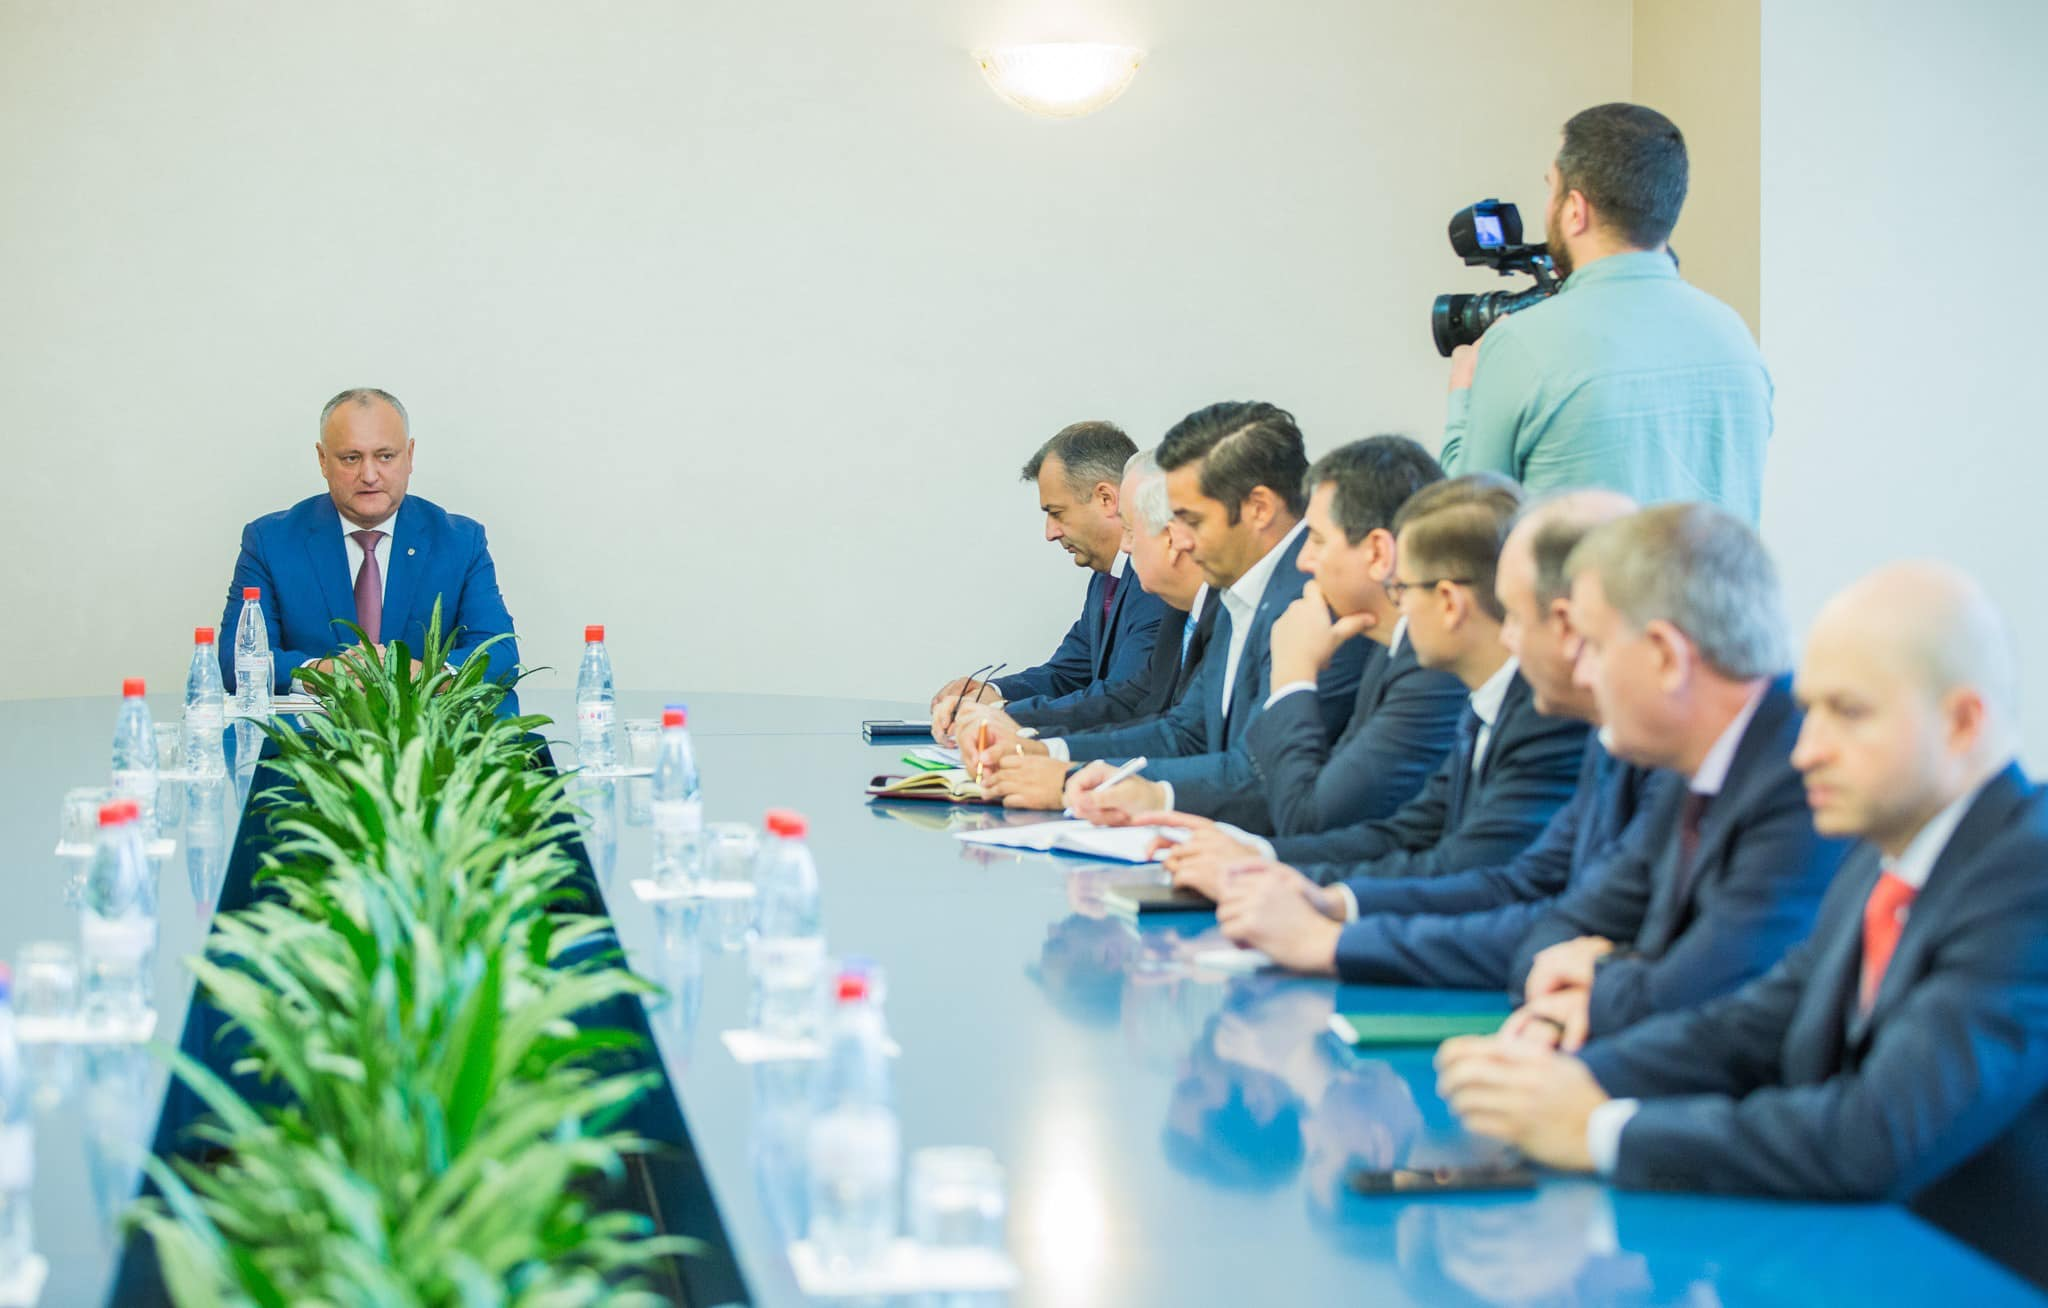 Додон провел встречу с руководителями коммерческих банков в Молдове (ФОТО, ВИДЕО)